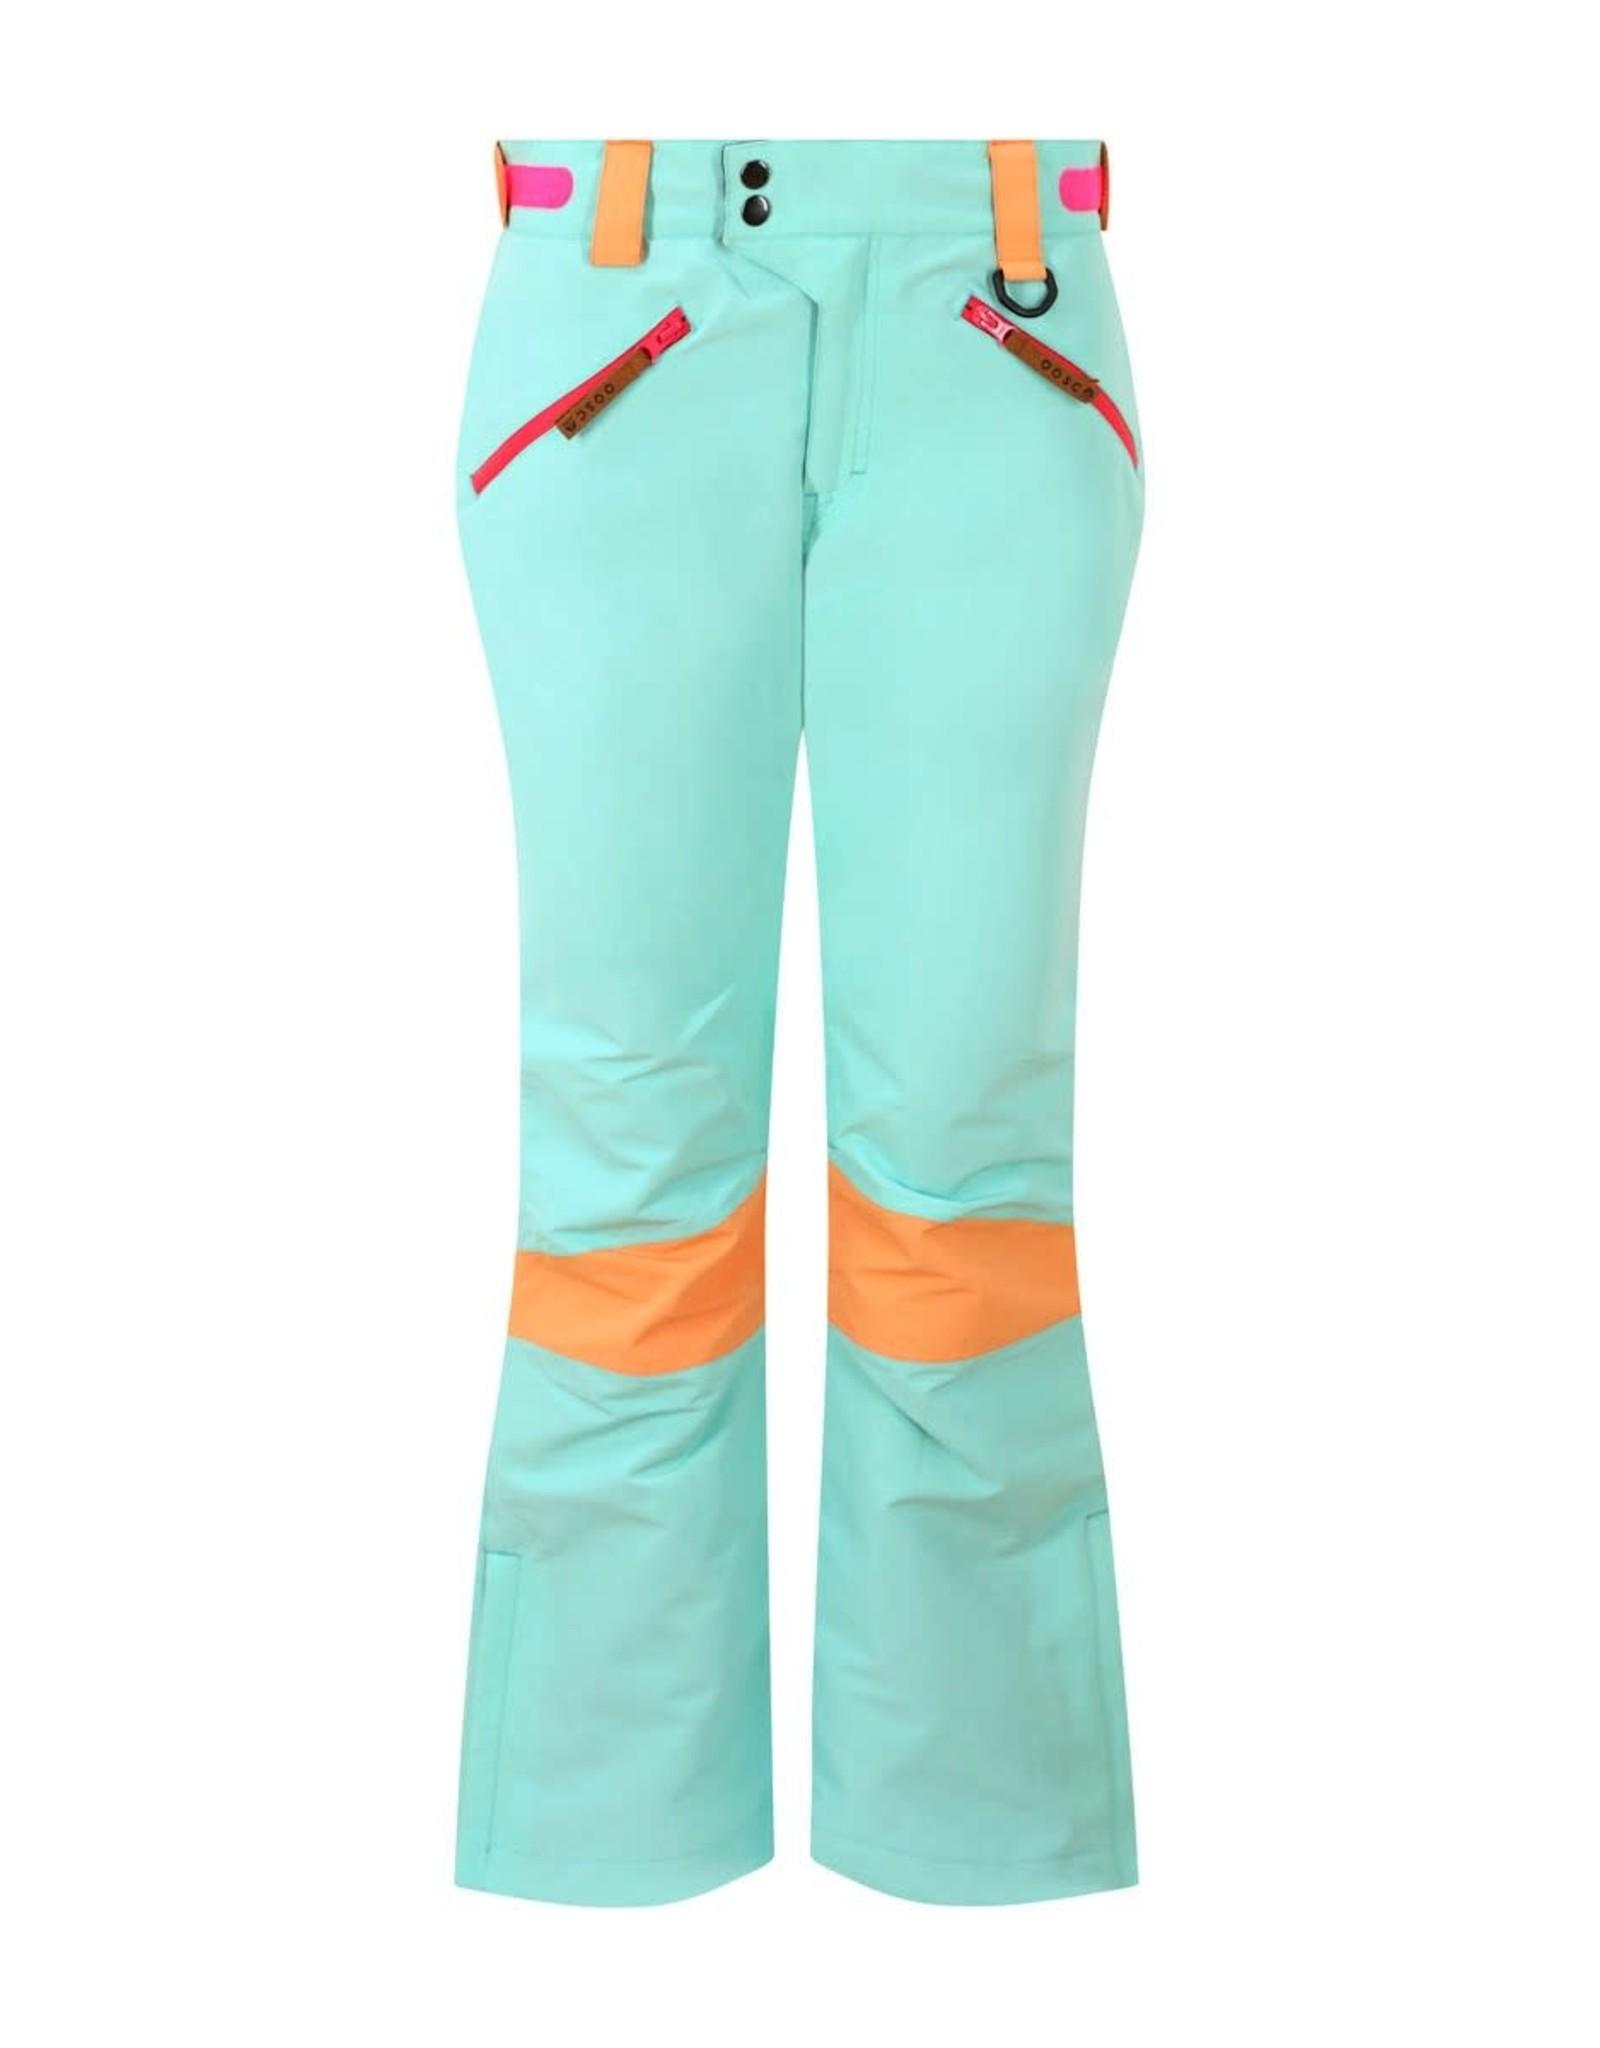 OOSC 1080 Women's Ski & Snowboard Pant – Pastel Mint